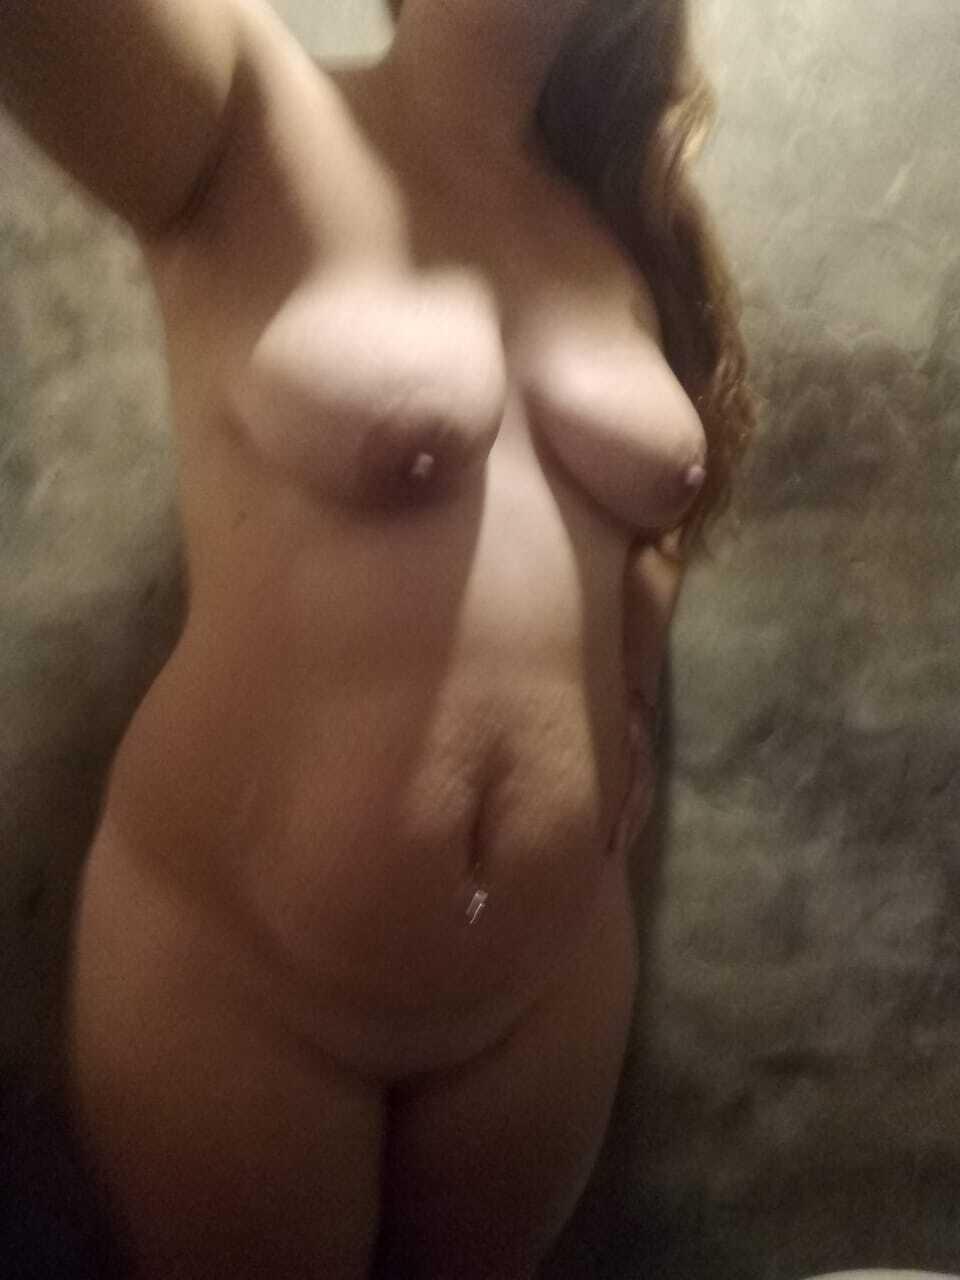 fotos mujeres putonas, mujeres para coger, sexo gratis con mujeres casadas